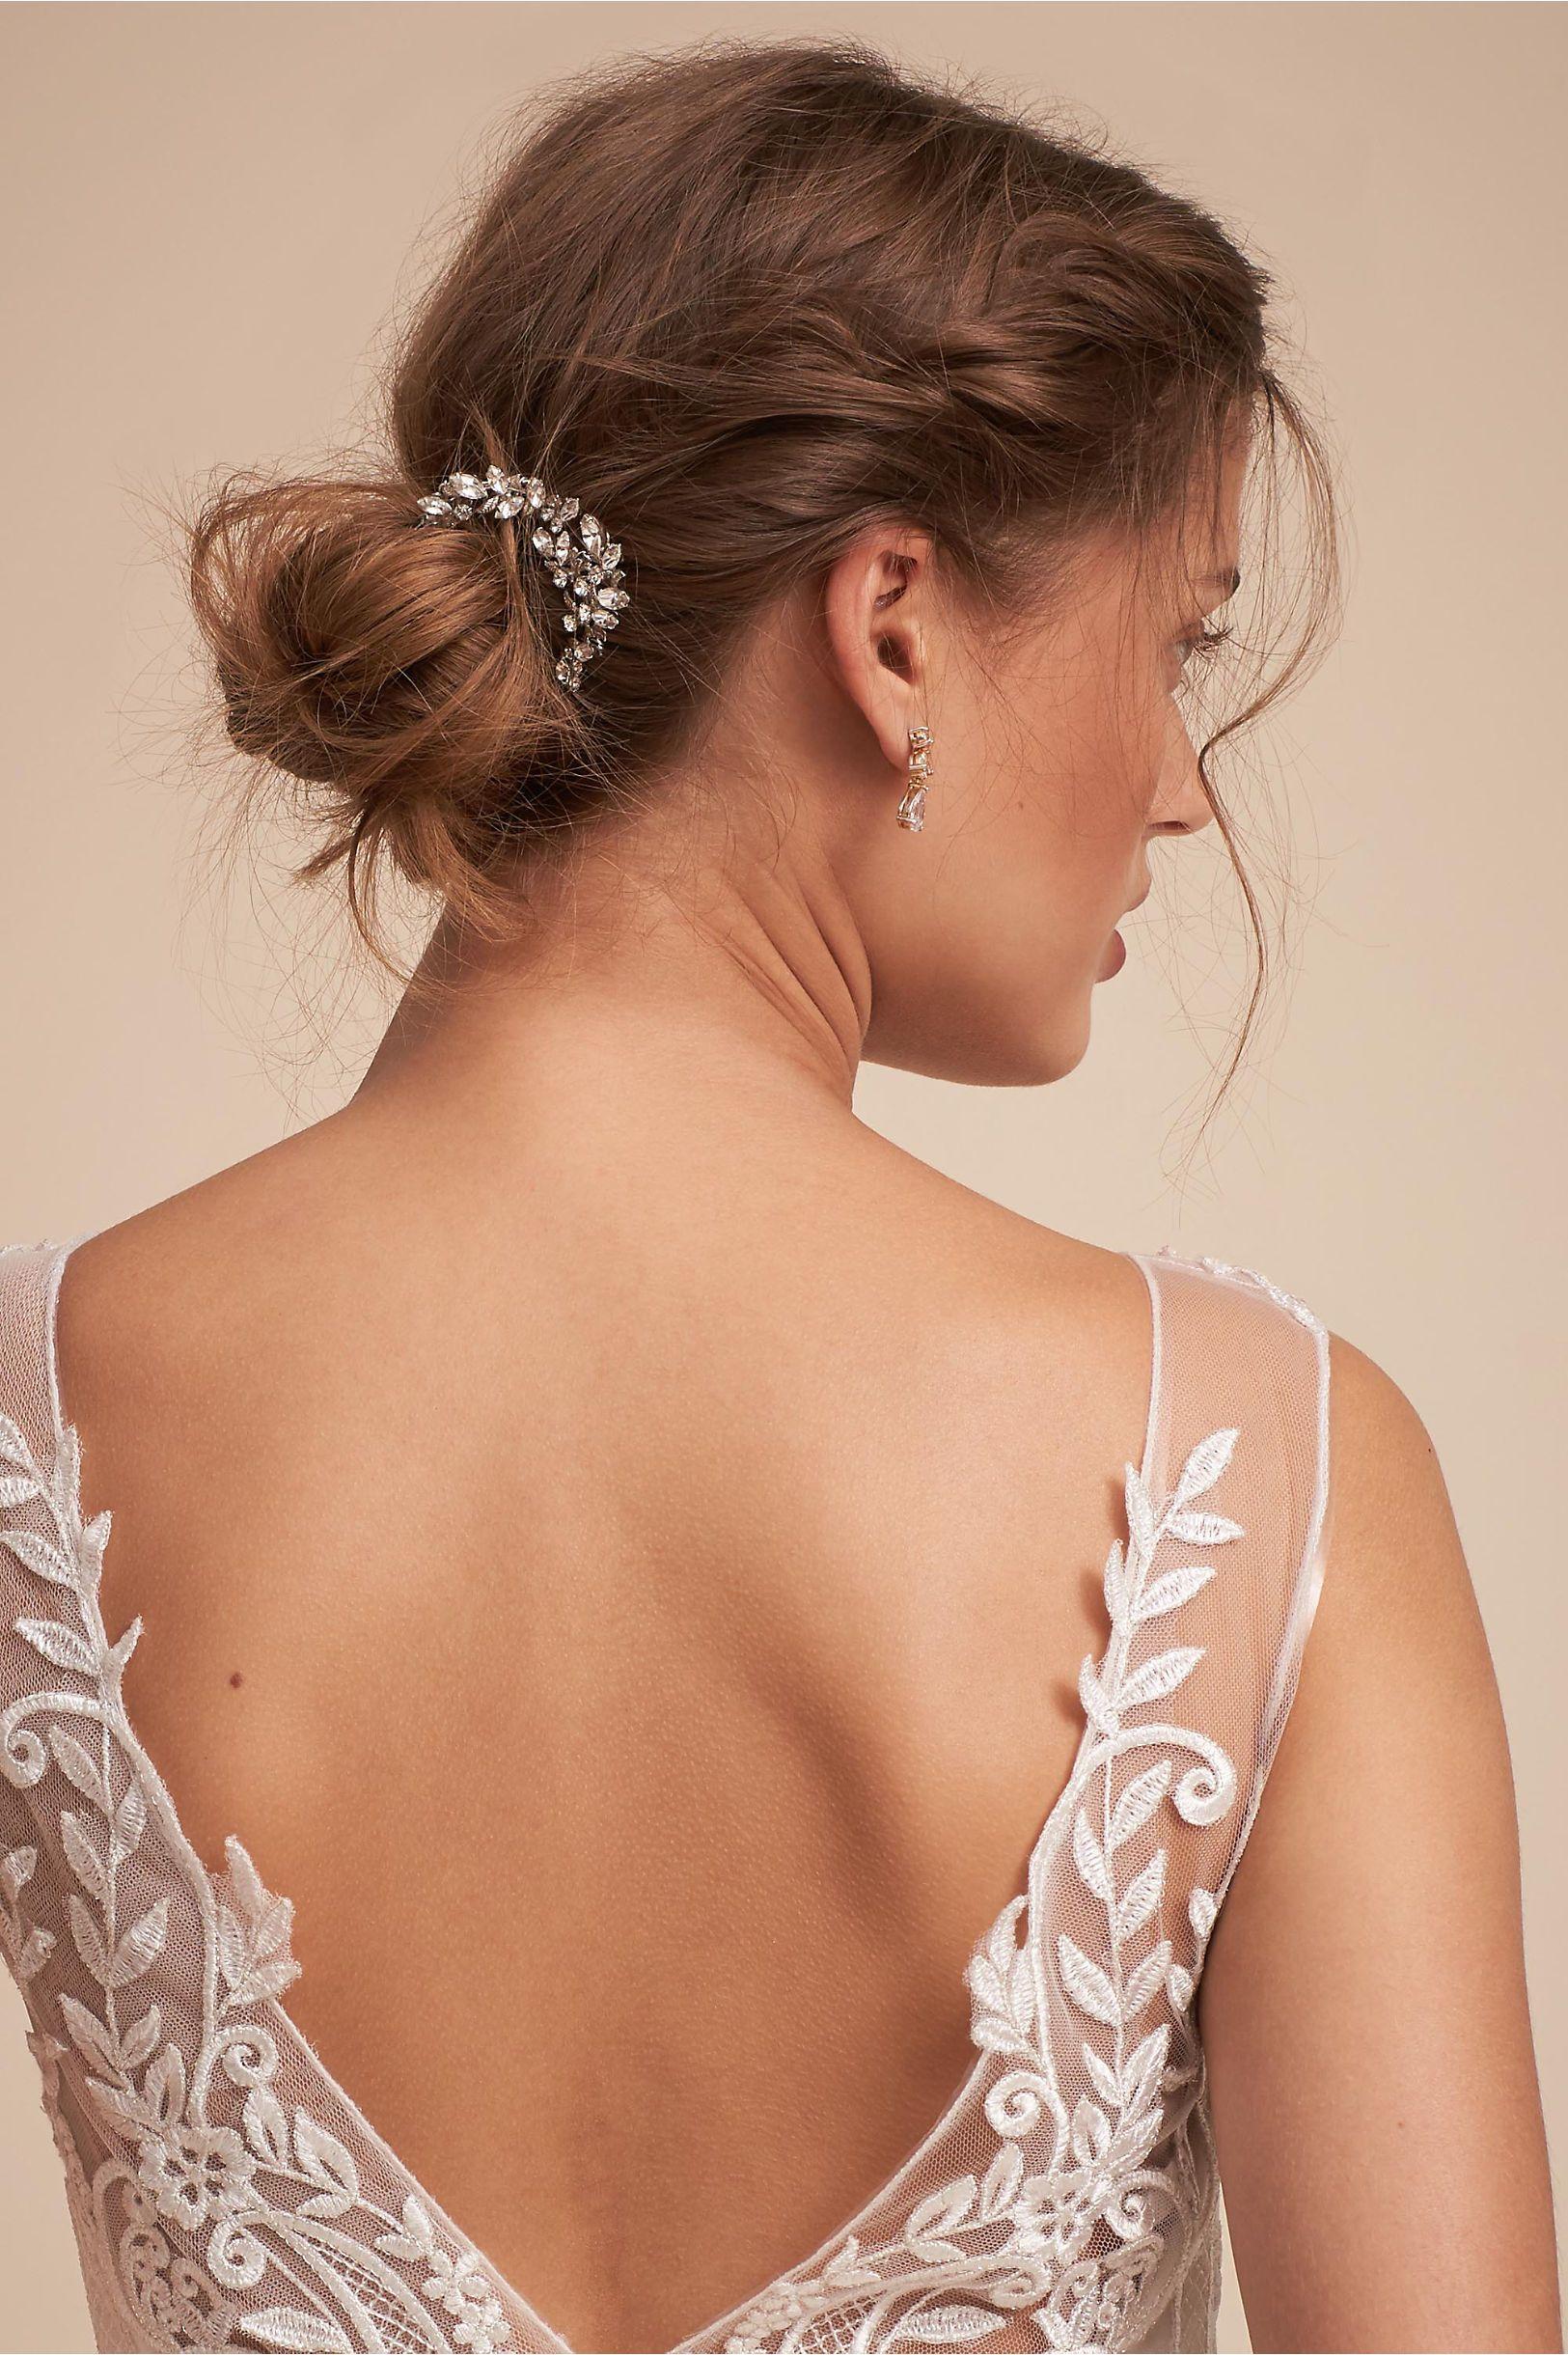 brockton hair combs (2)   products   elegant wedding hair